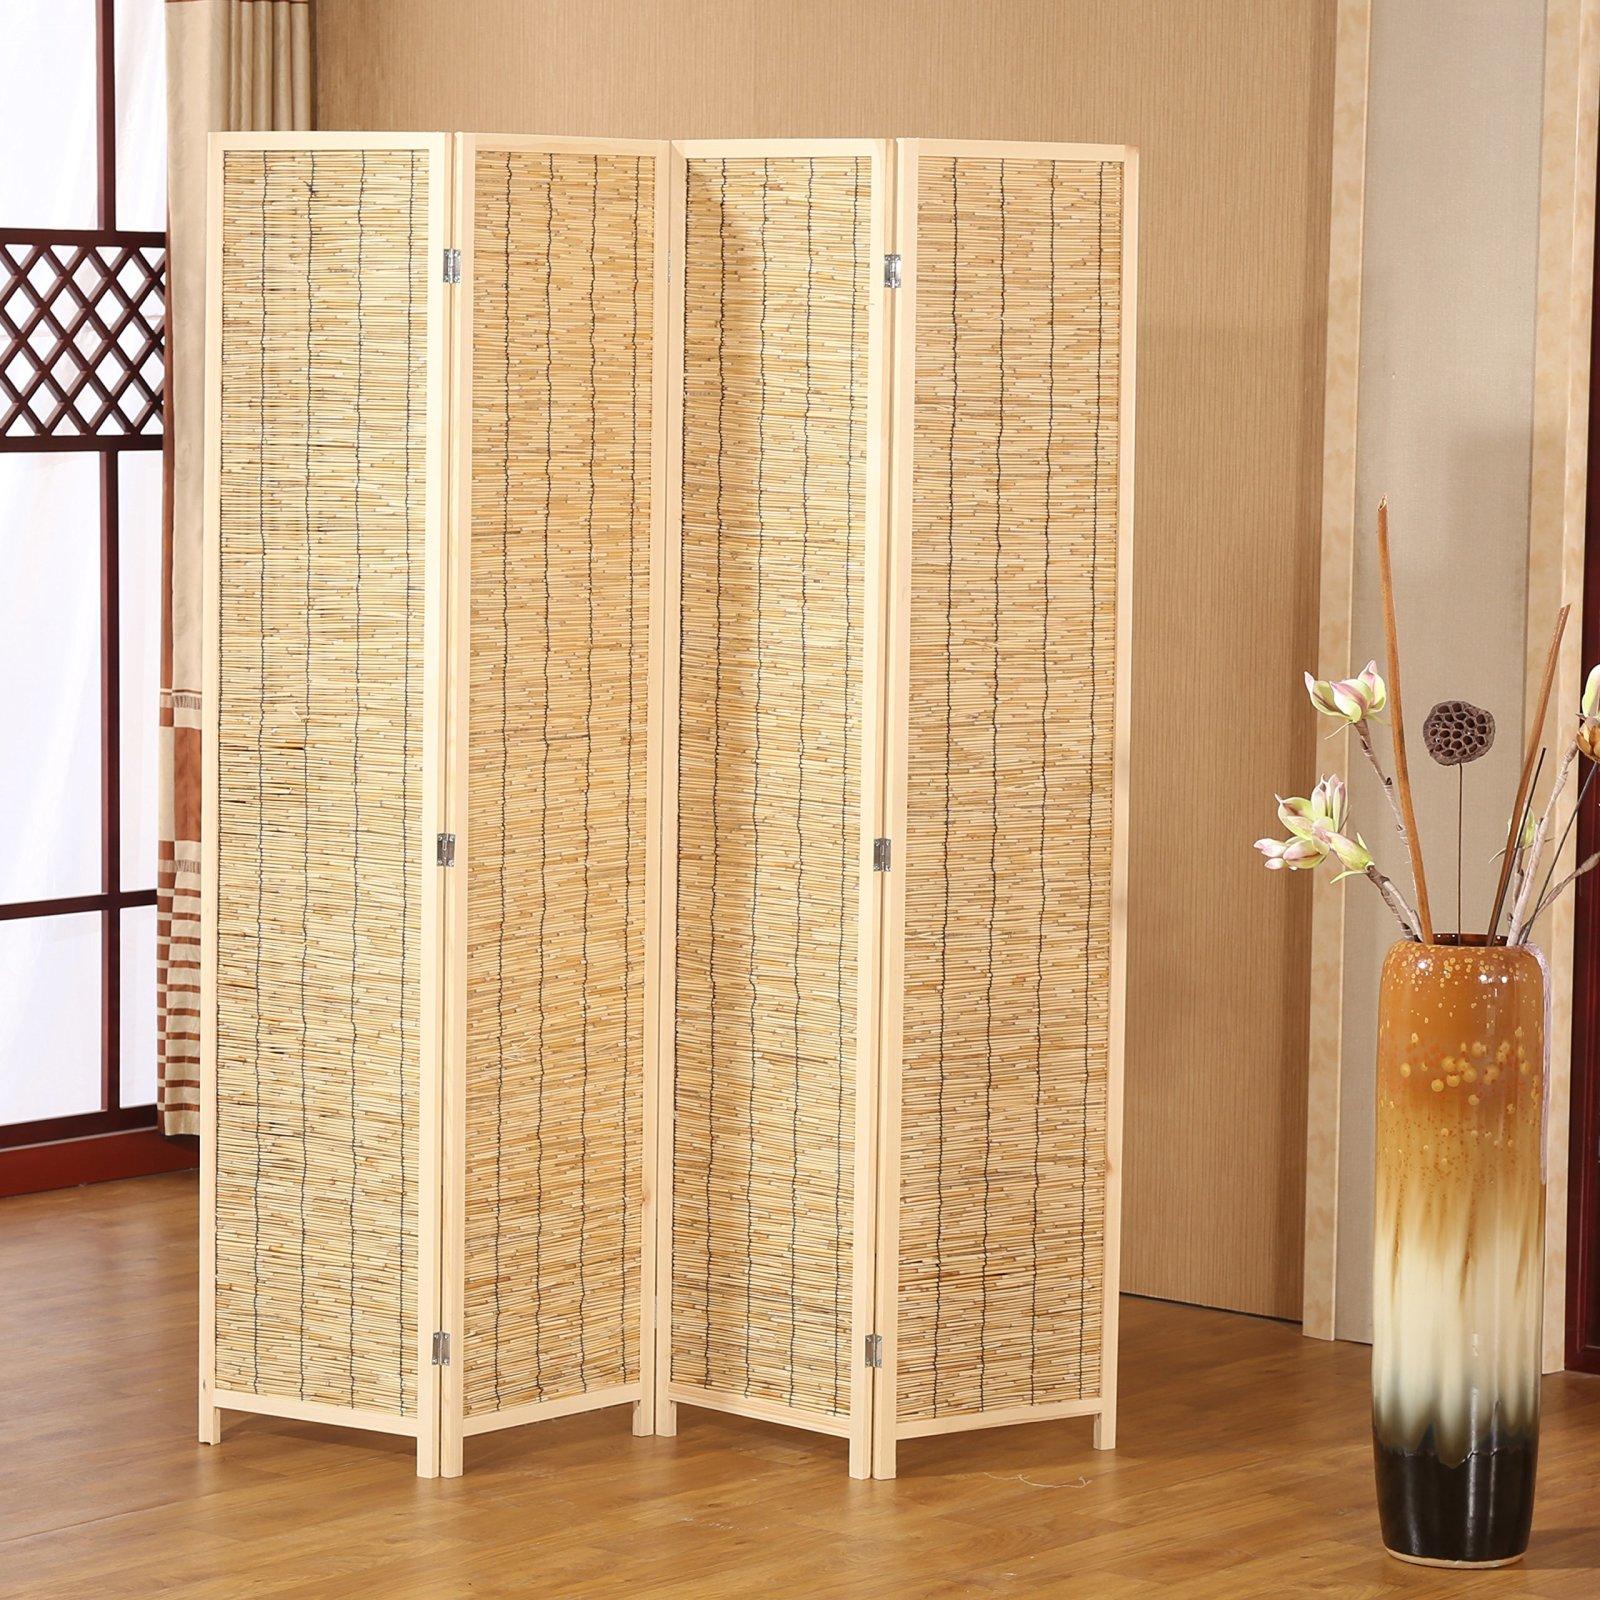 news warping hardware barn wooden dividers panels pivot temporary divider walls partitions sliding honeycomb wood door and room patented non